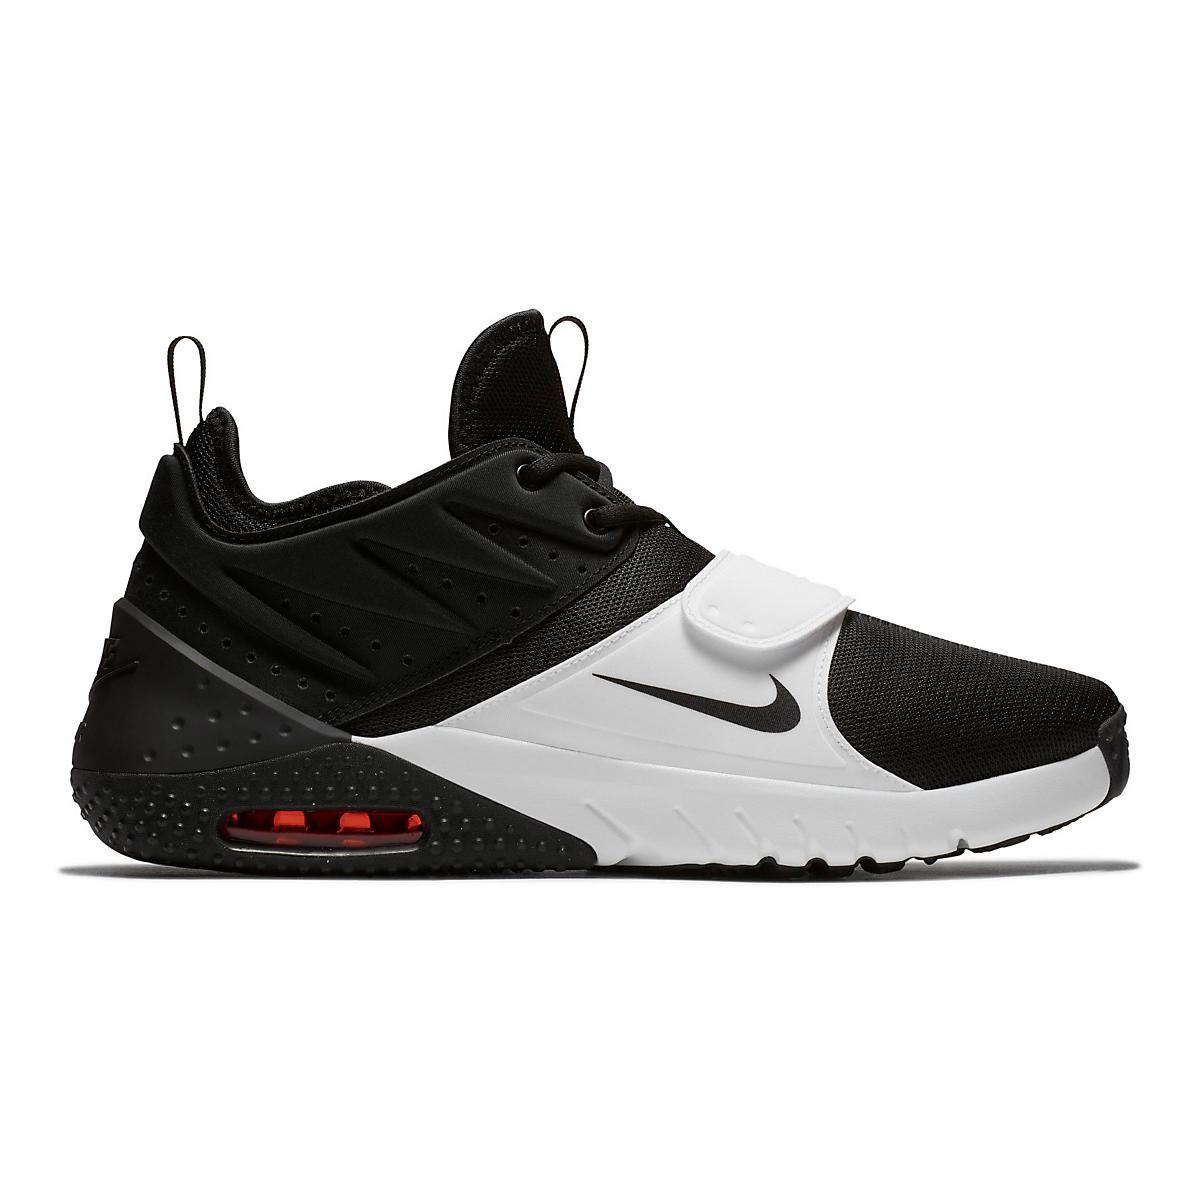 detailed look 2eae4 0292a ... denmark mens nike air max trainer 1 cross training shoe at road runner  sports eec79 93cbf